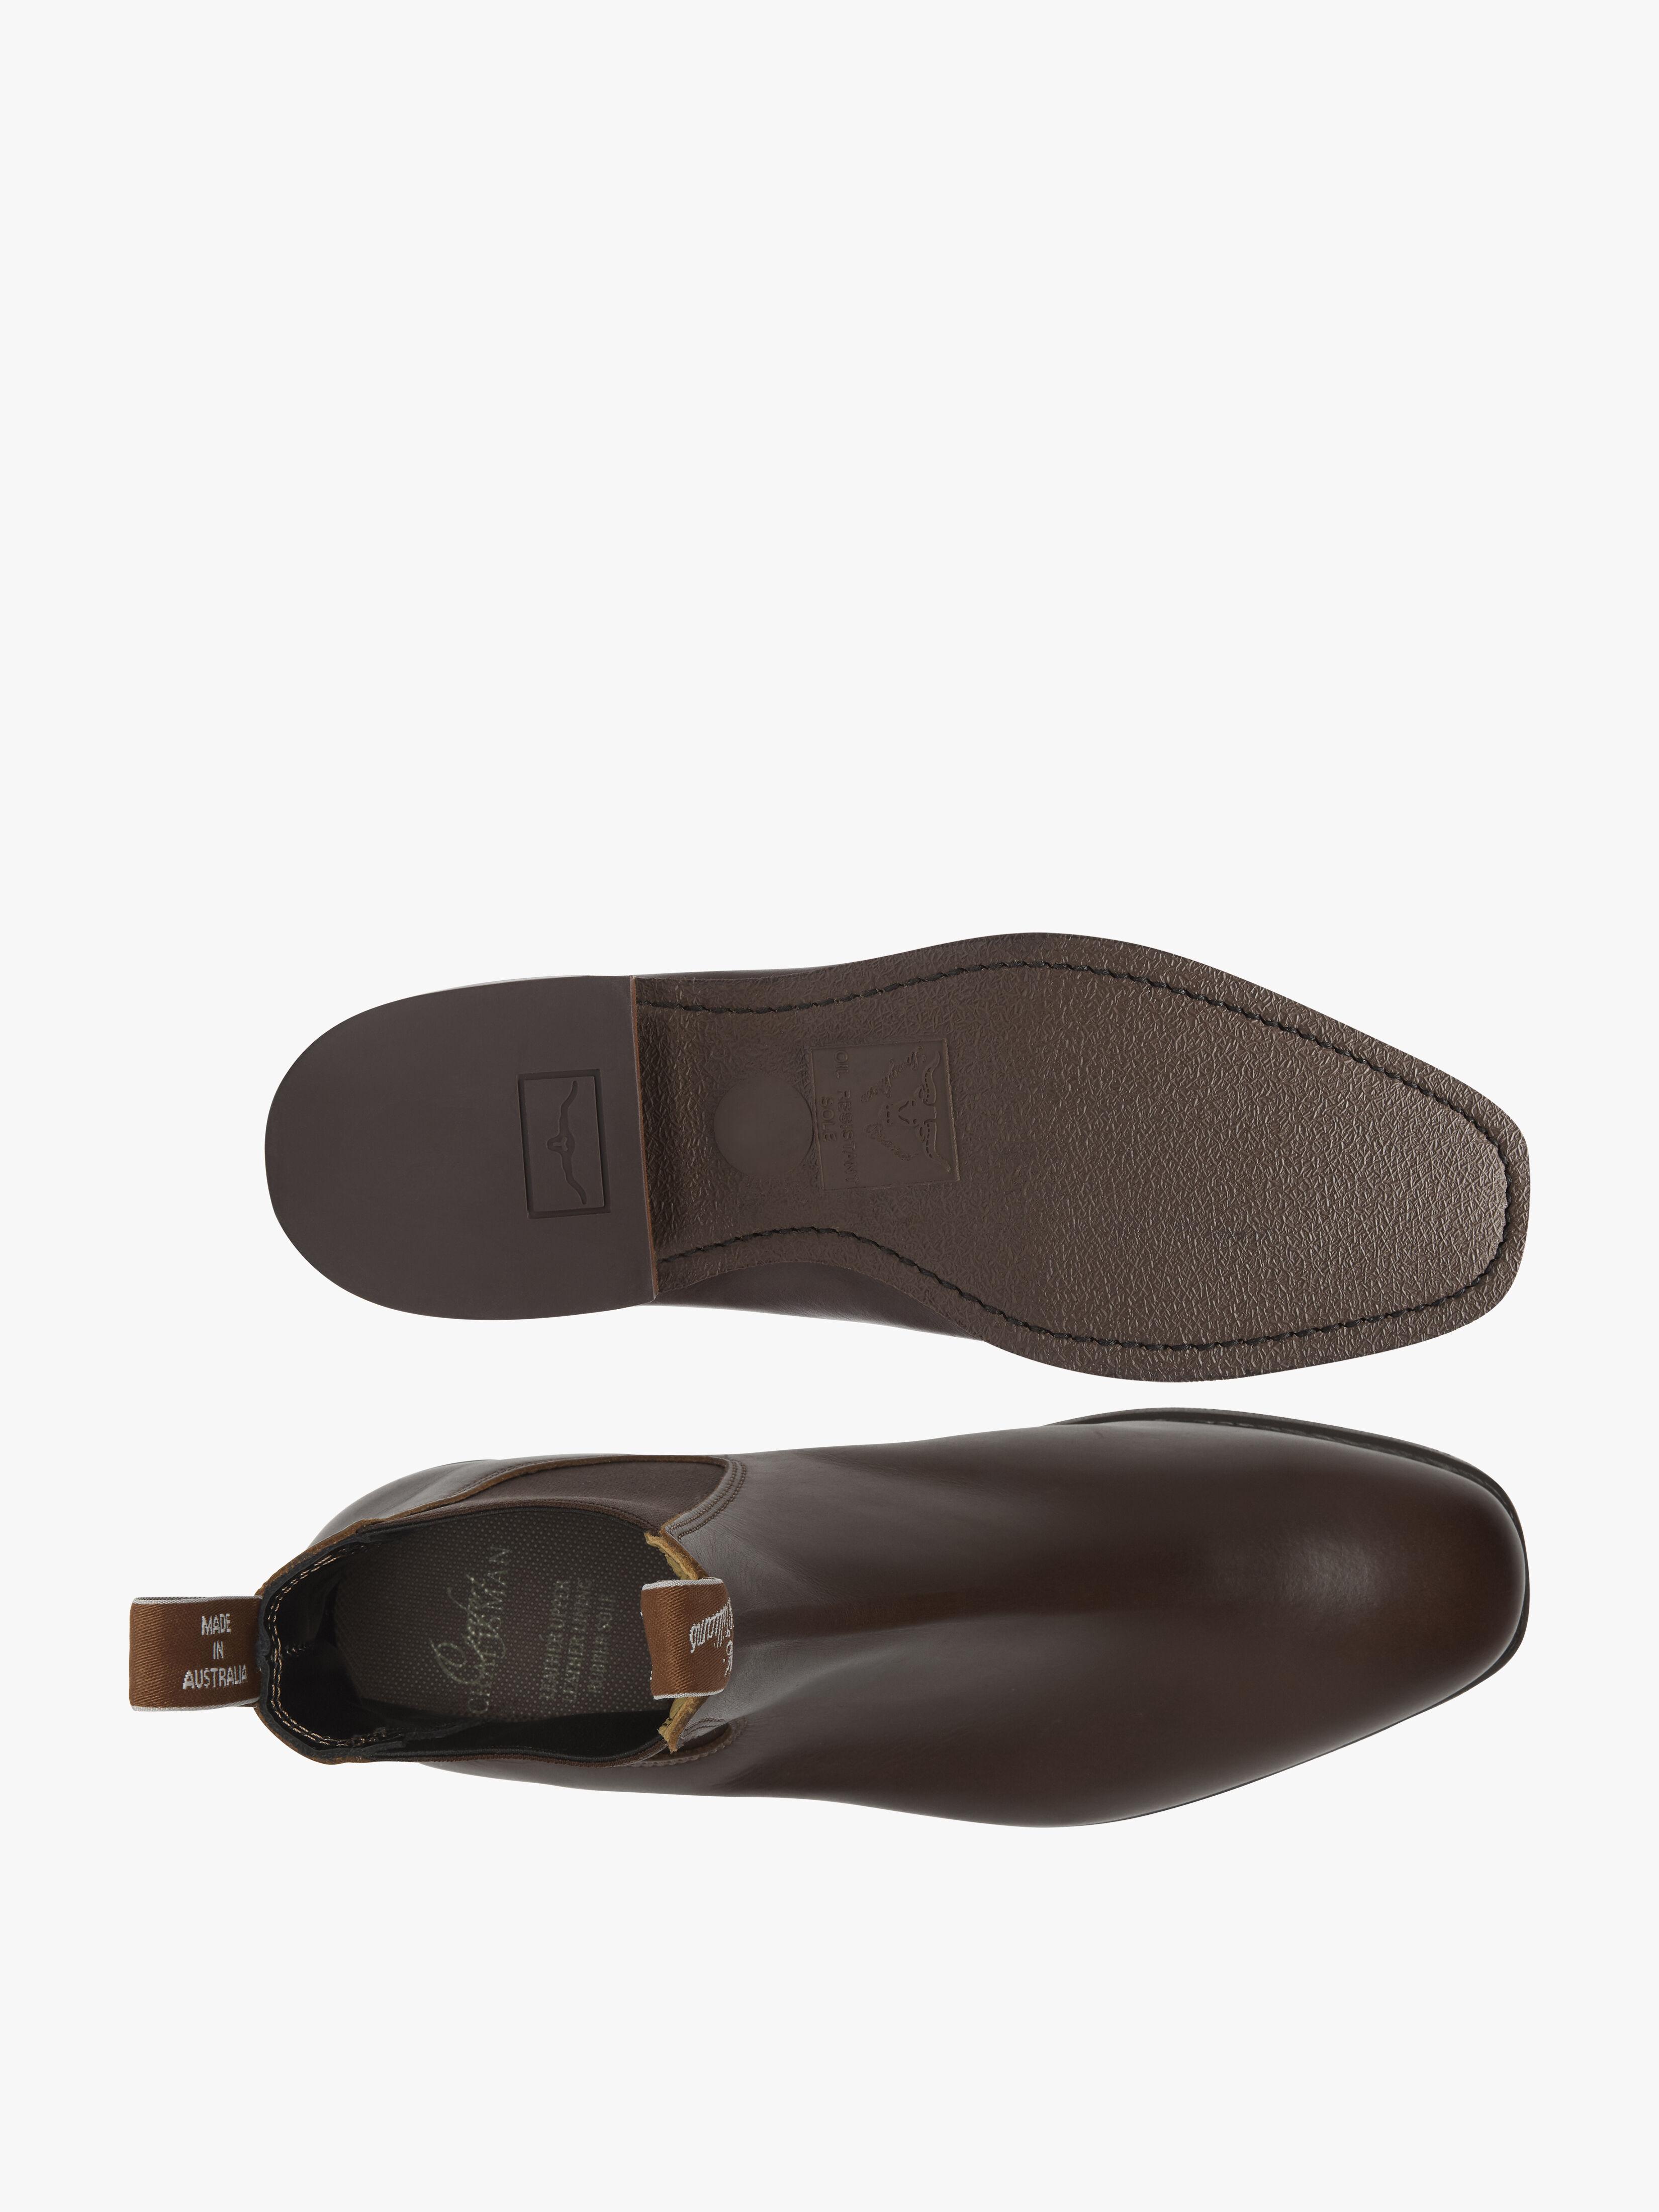 Comfort Craftsman Boot - leather - R.M